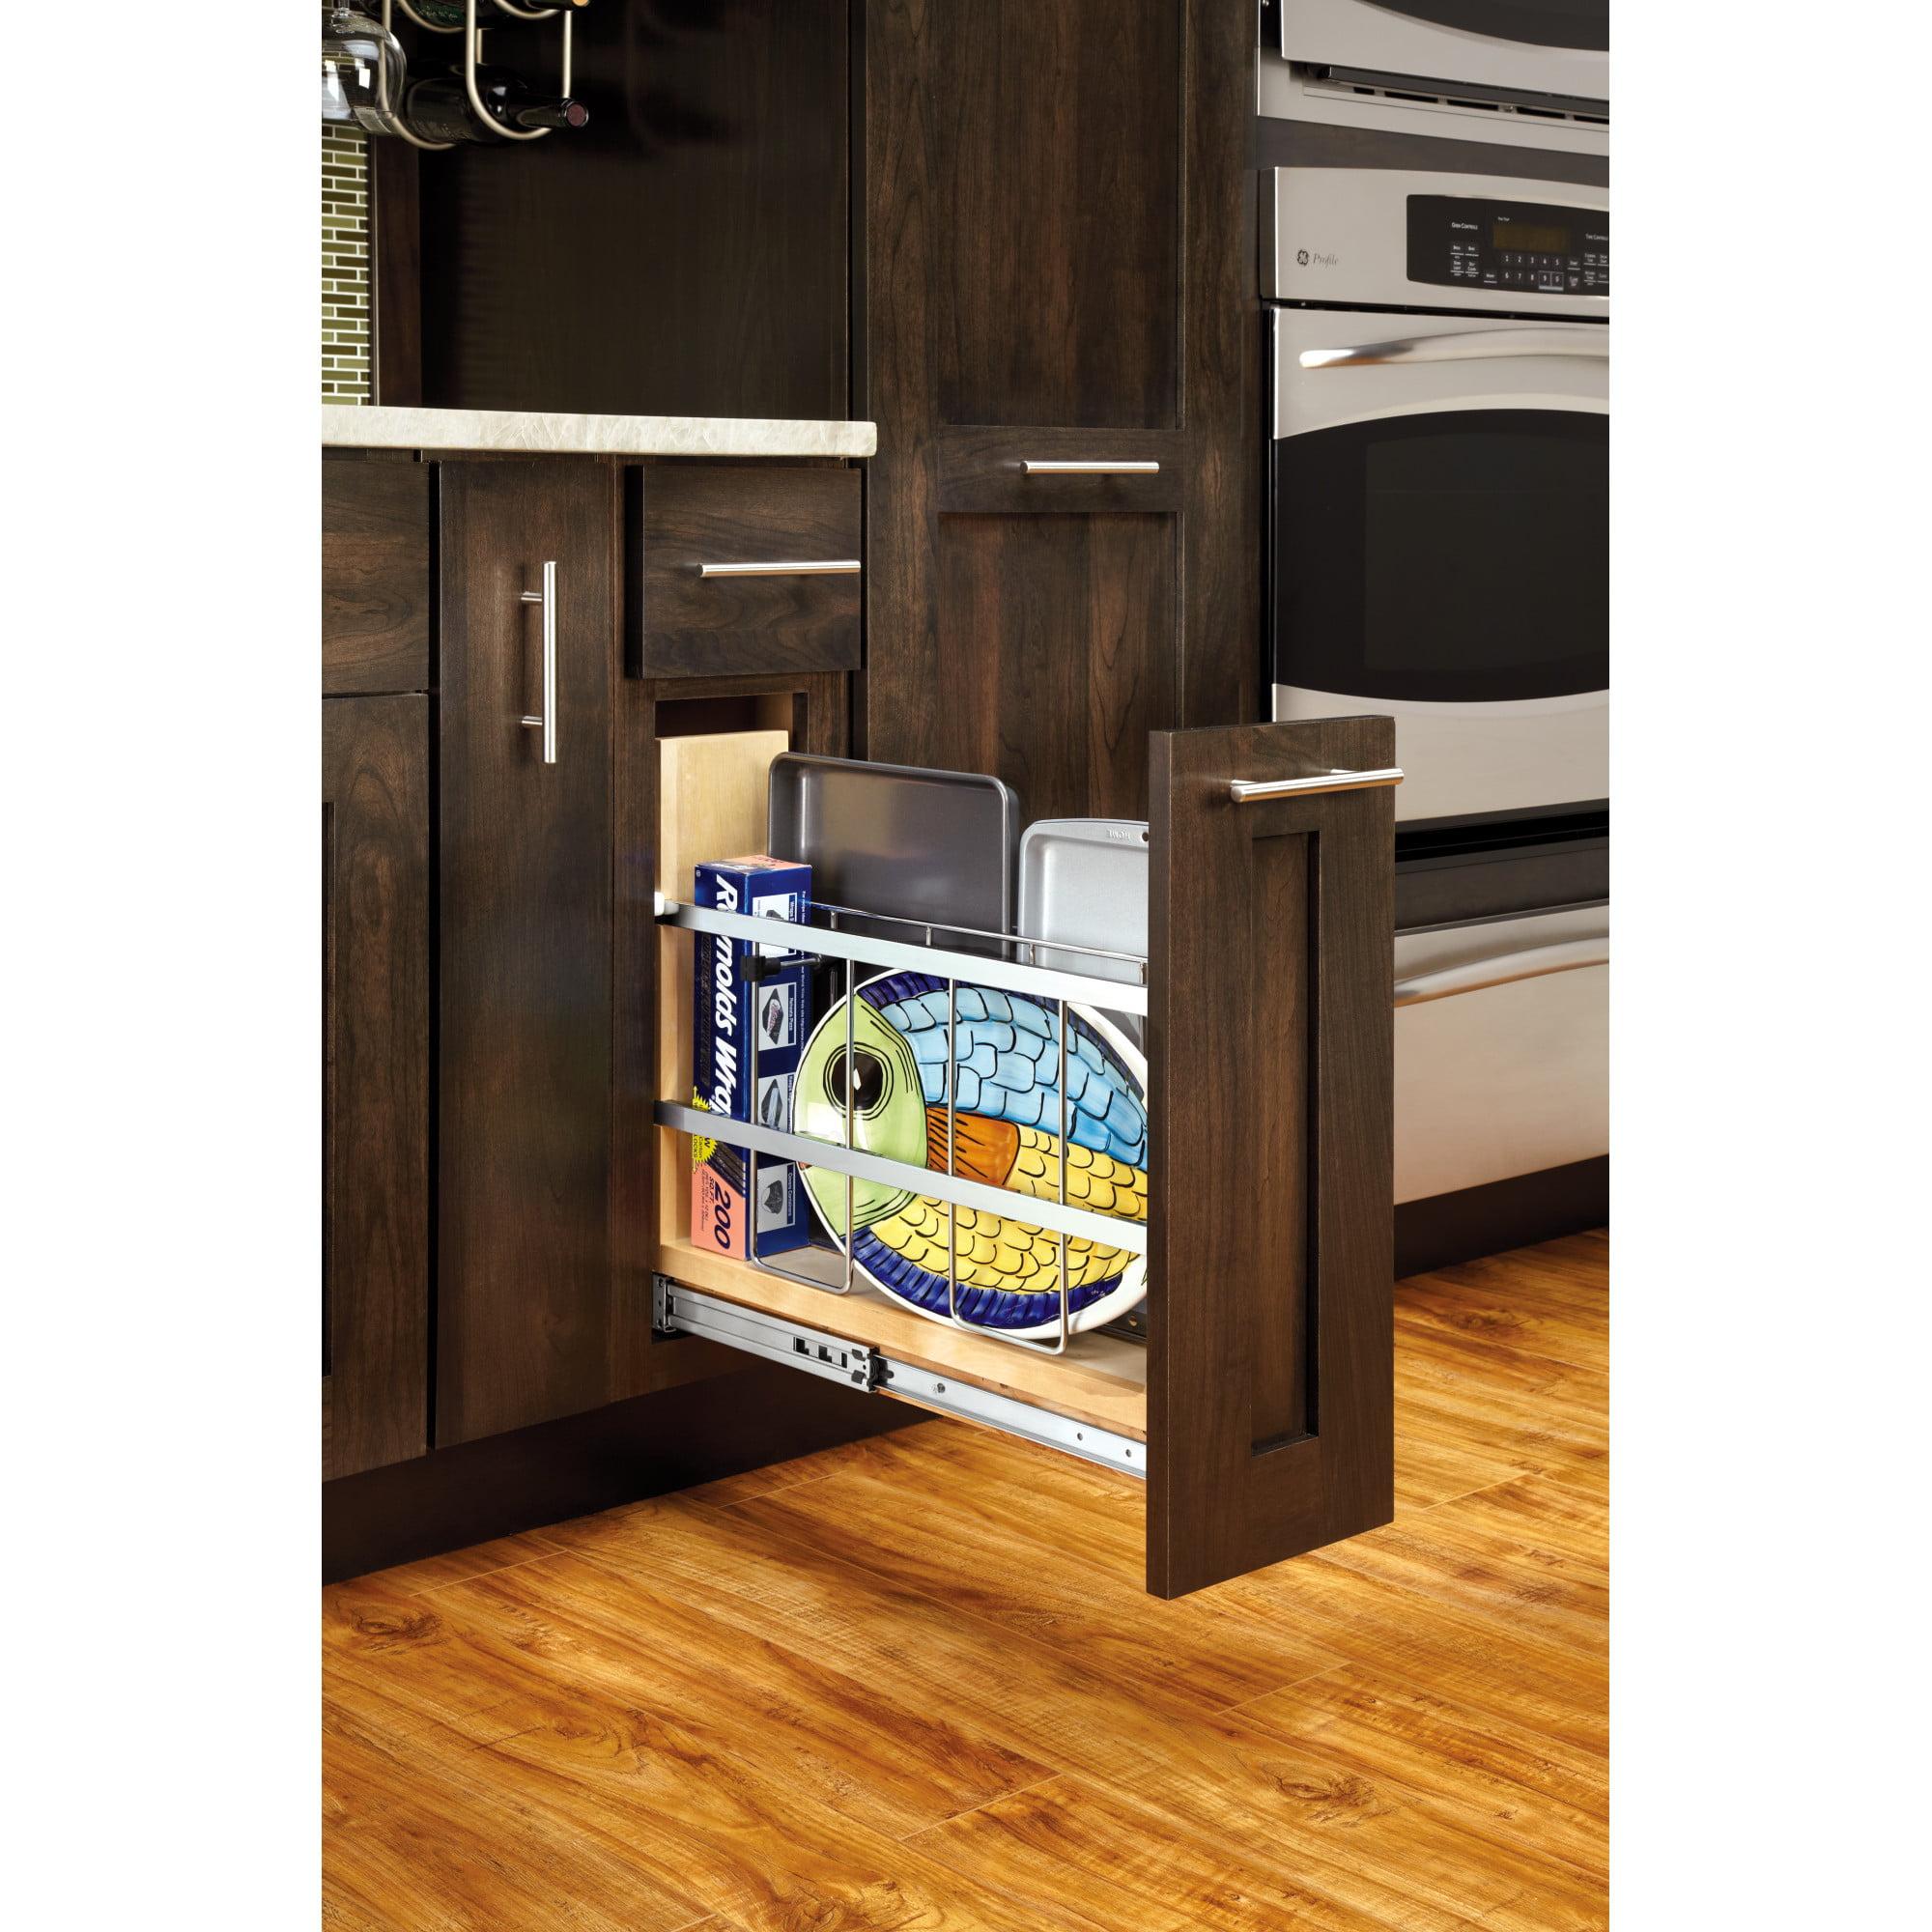 Rev A Shelf Pullout Tray Divider Cabinet Organizer With Ball Bearing Soft Close Slides Maple Walmart Com Walmart Com